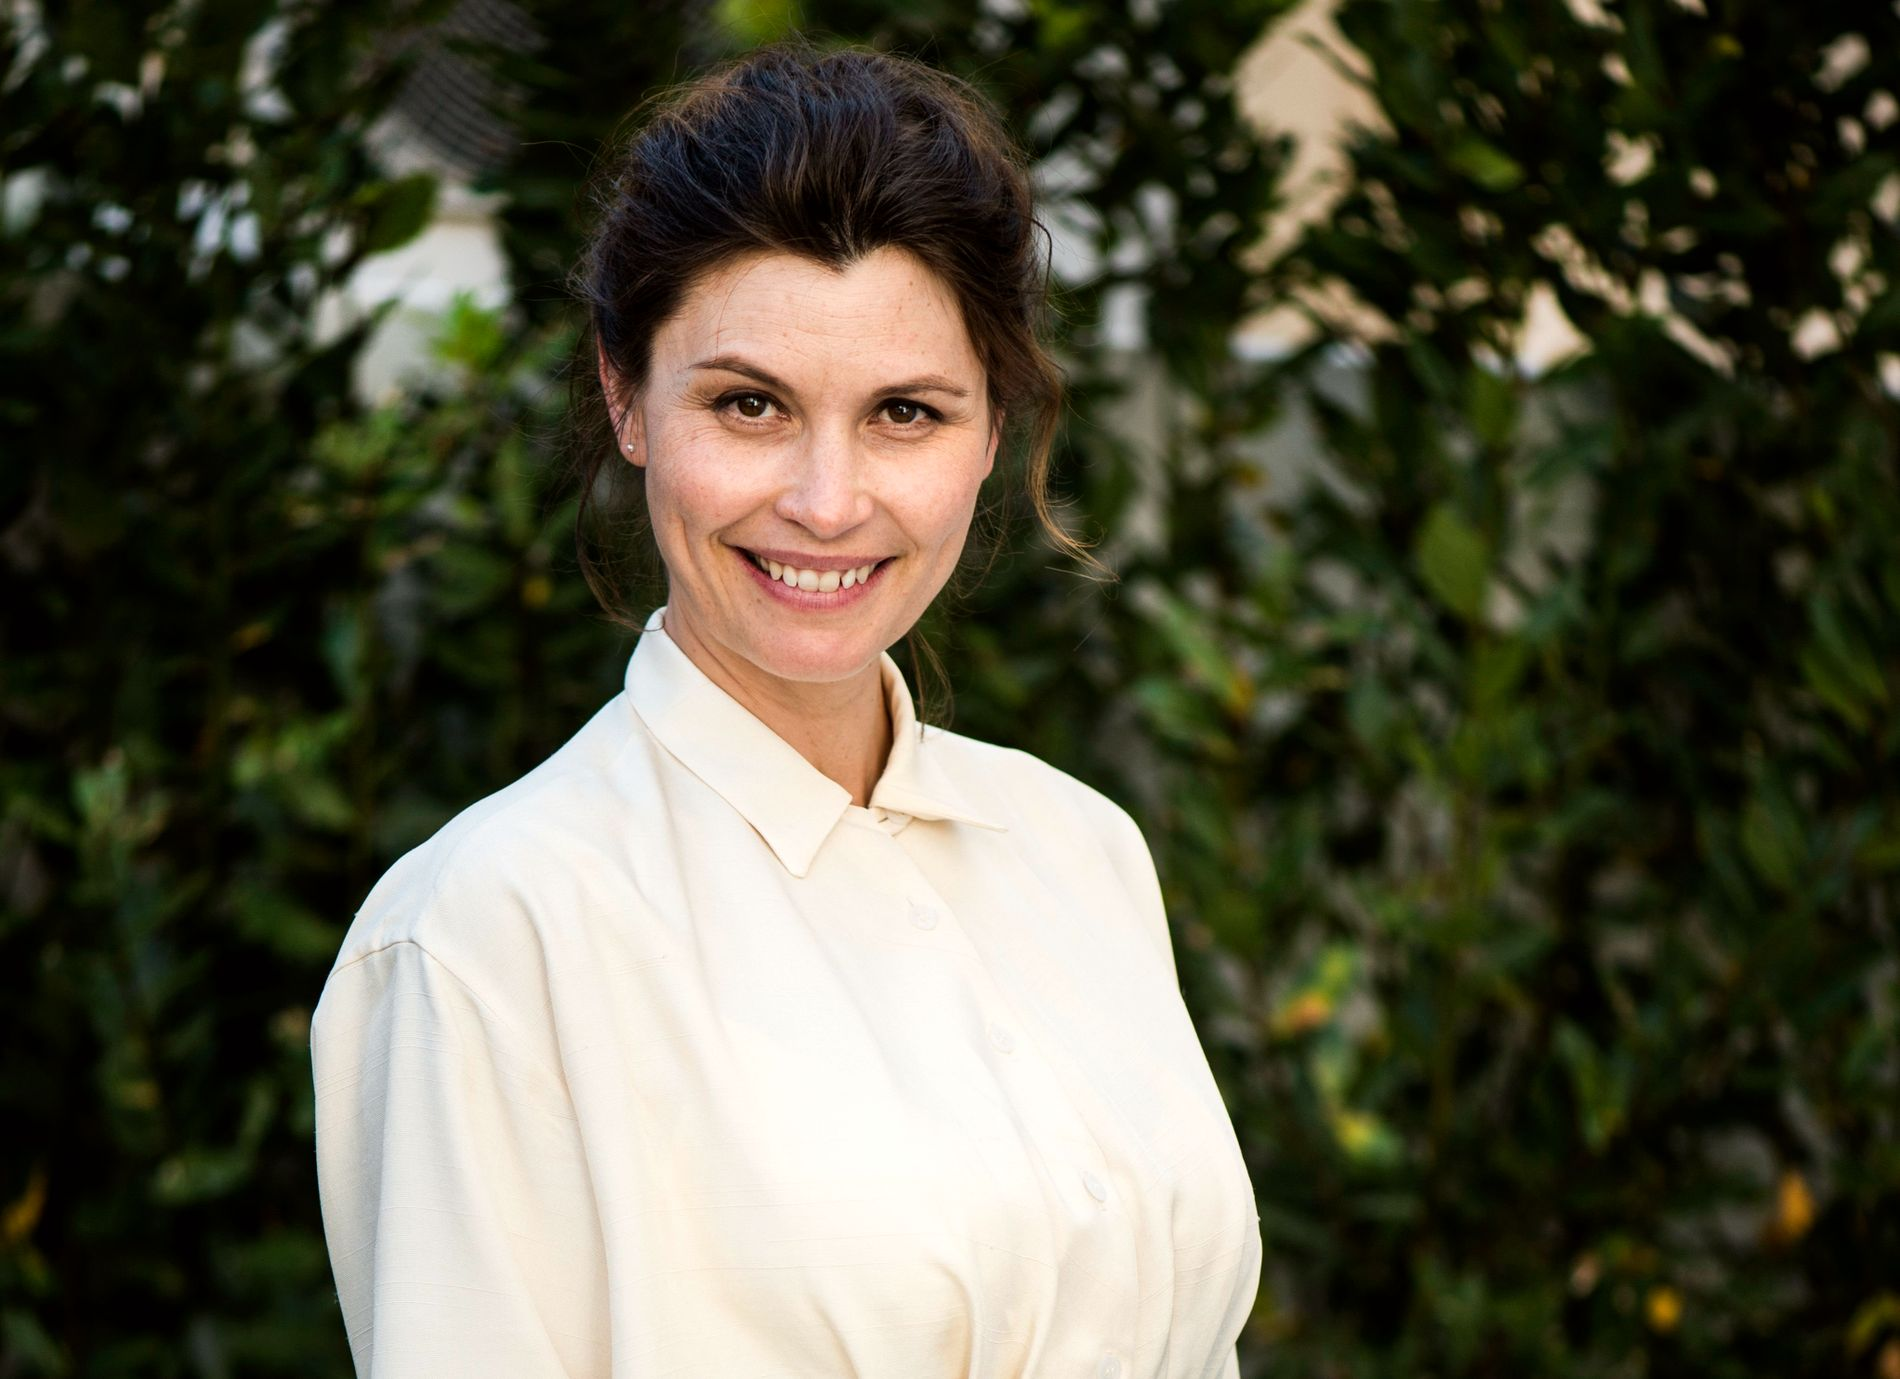 KRIGERKLAR: Lisa Loven Kongsli på filmfestivalen i Cannes med Ruben Östlunds film «Turist» i 2014. I år vant Östlund i Cannes.